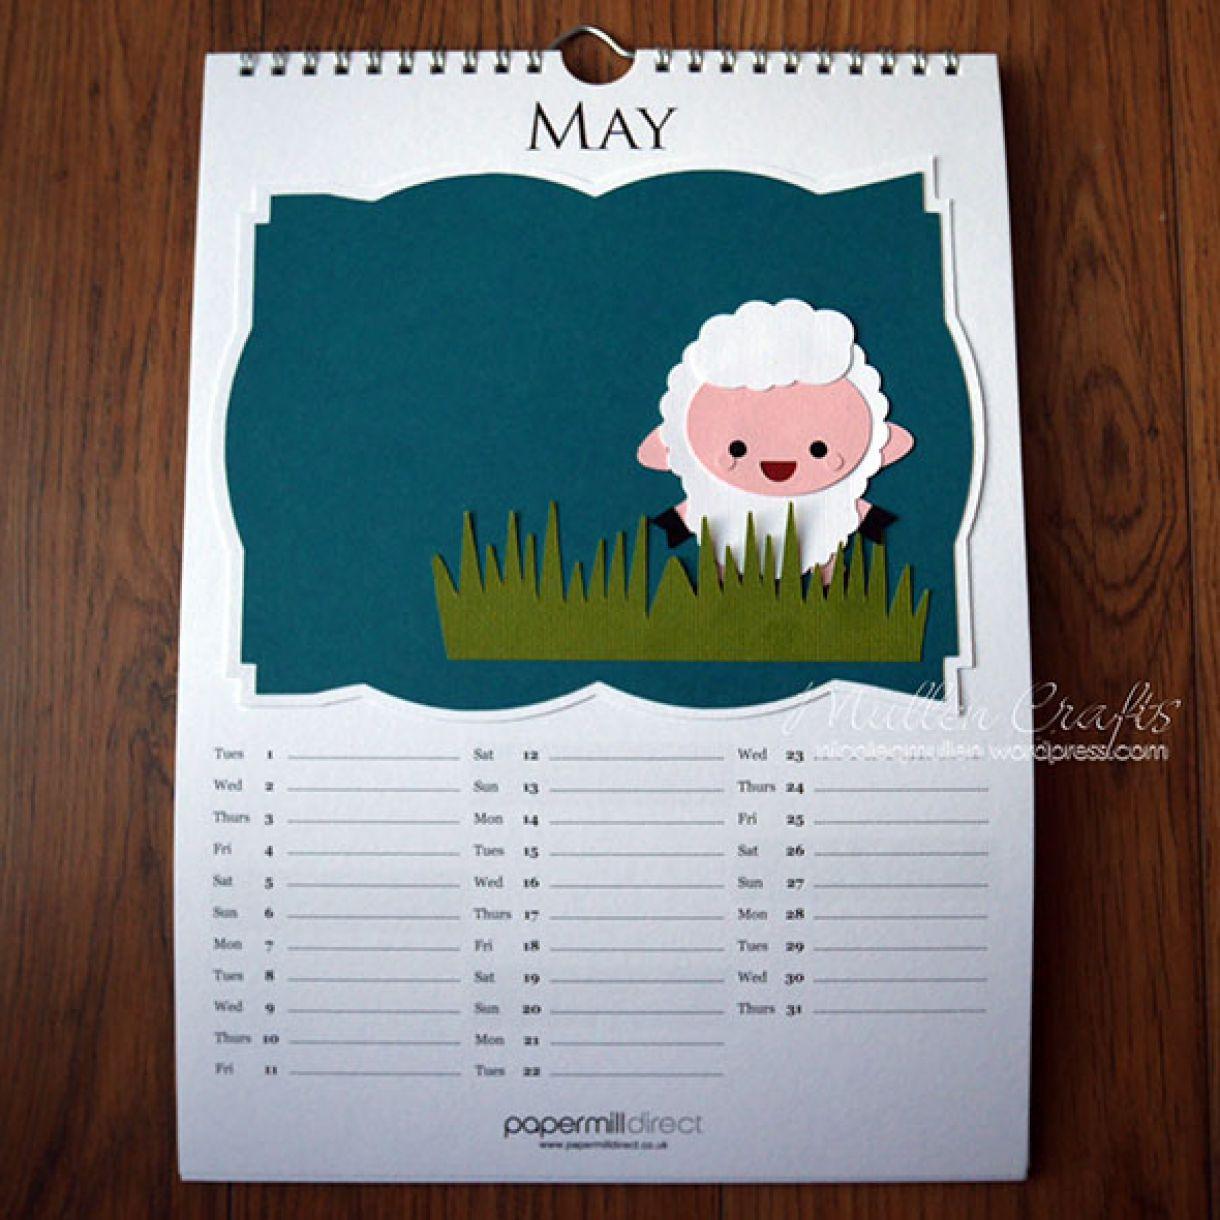 Nicole 2018 Calendar May1